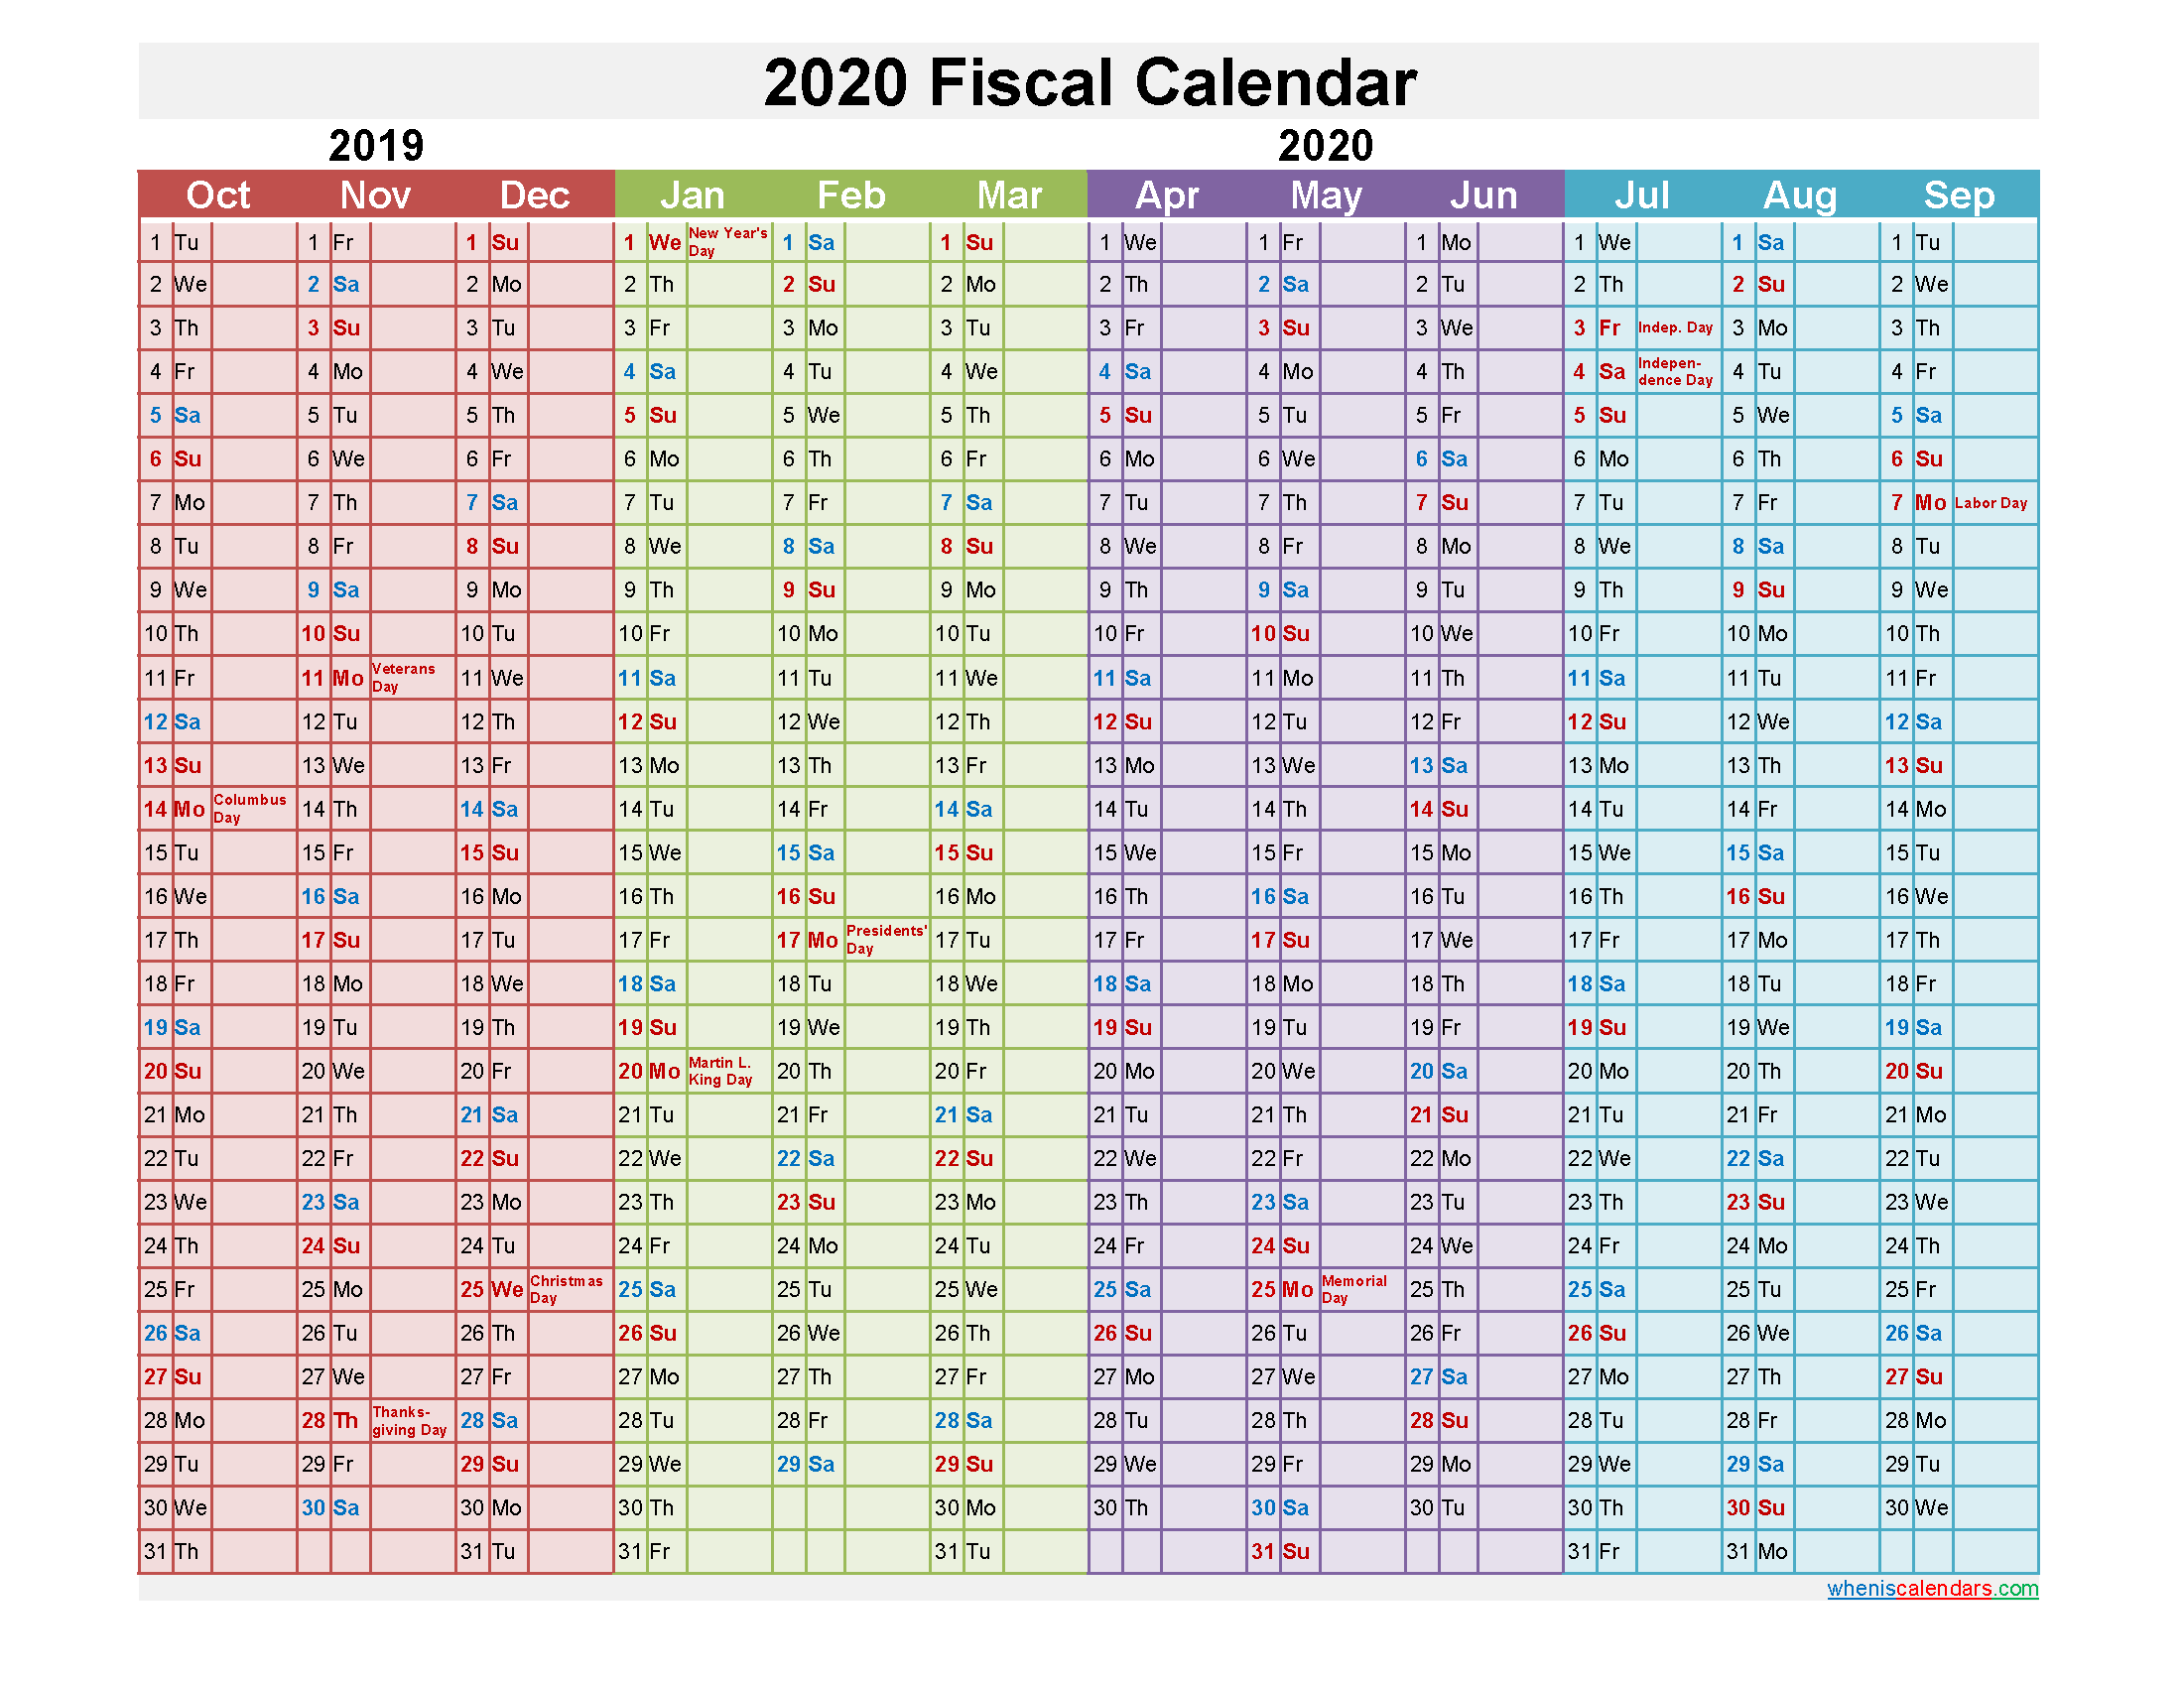 Fiscal Year 2020 Calendar